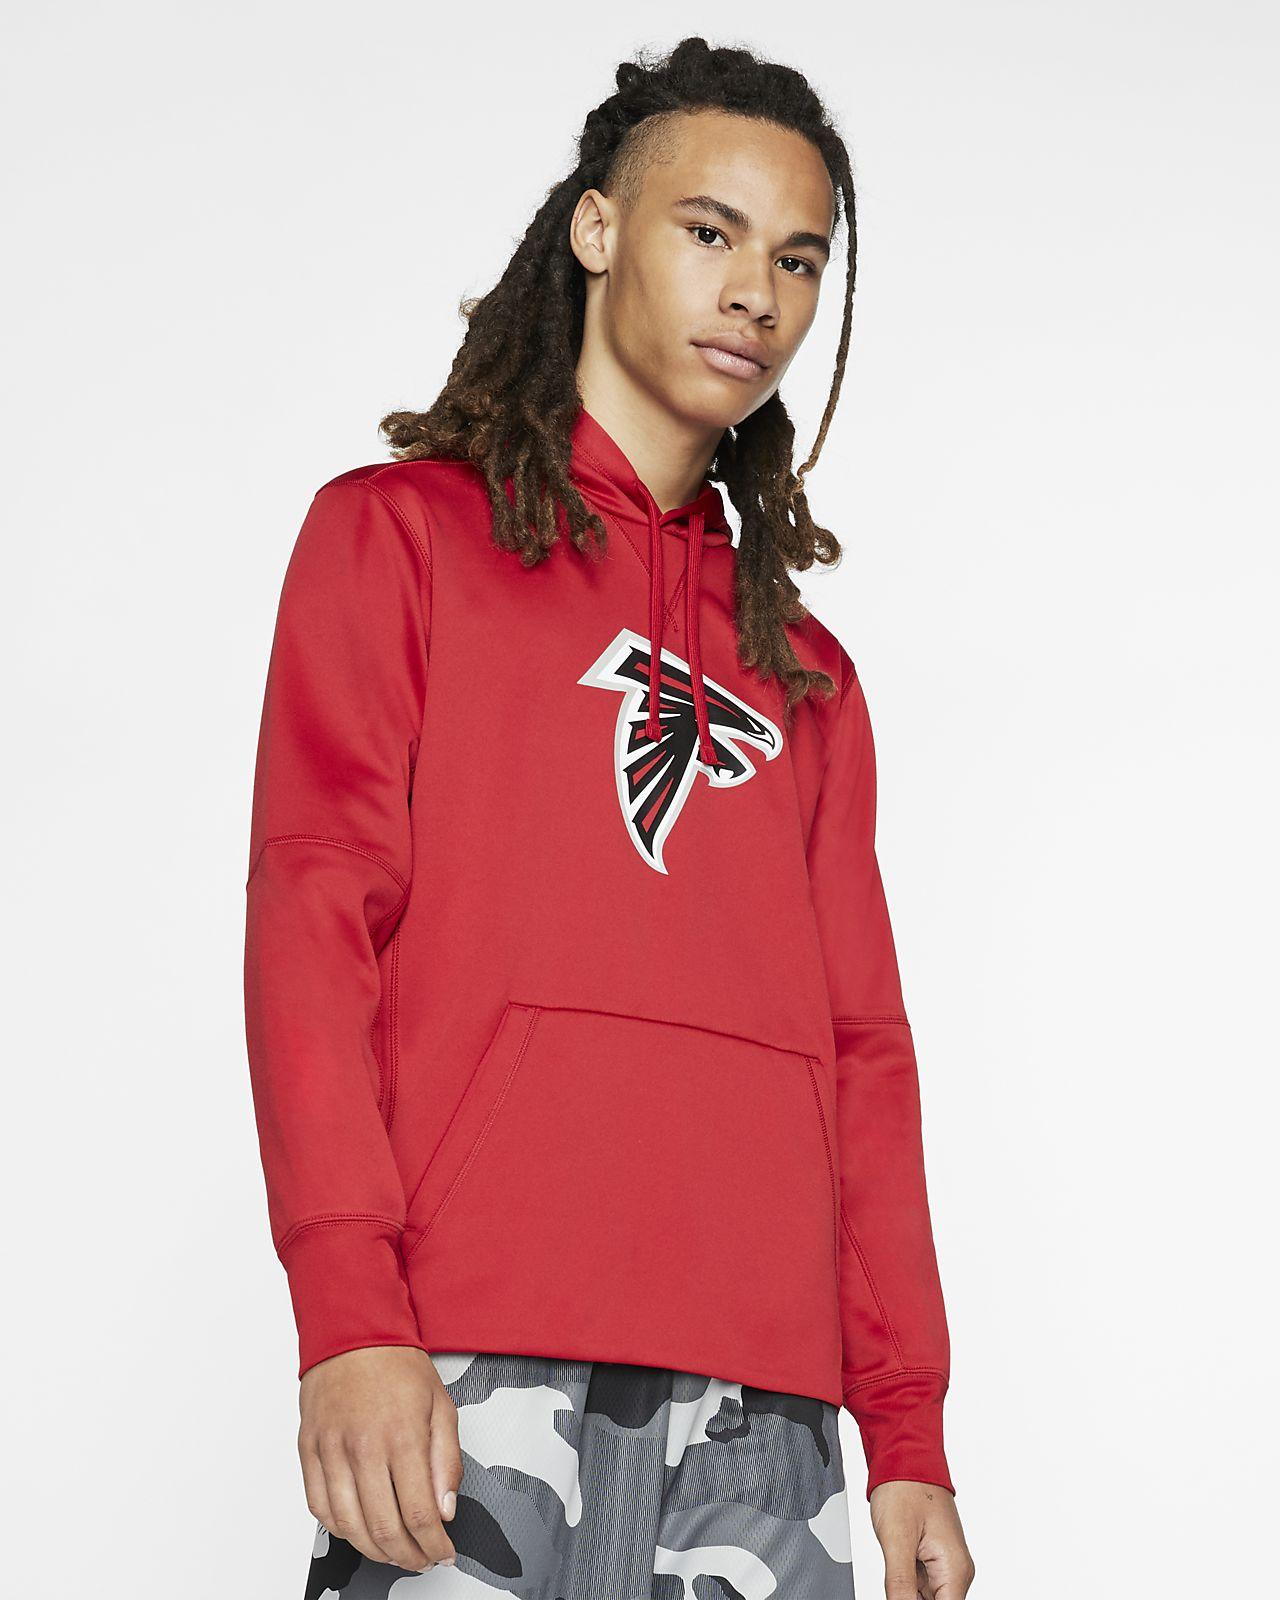 Nike Dri-FIT (NFL Falcons) Herren-Hoodie